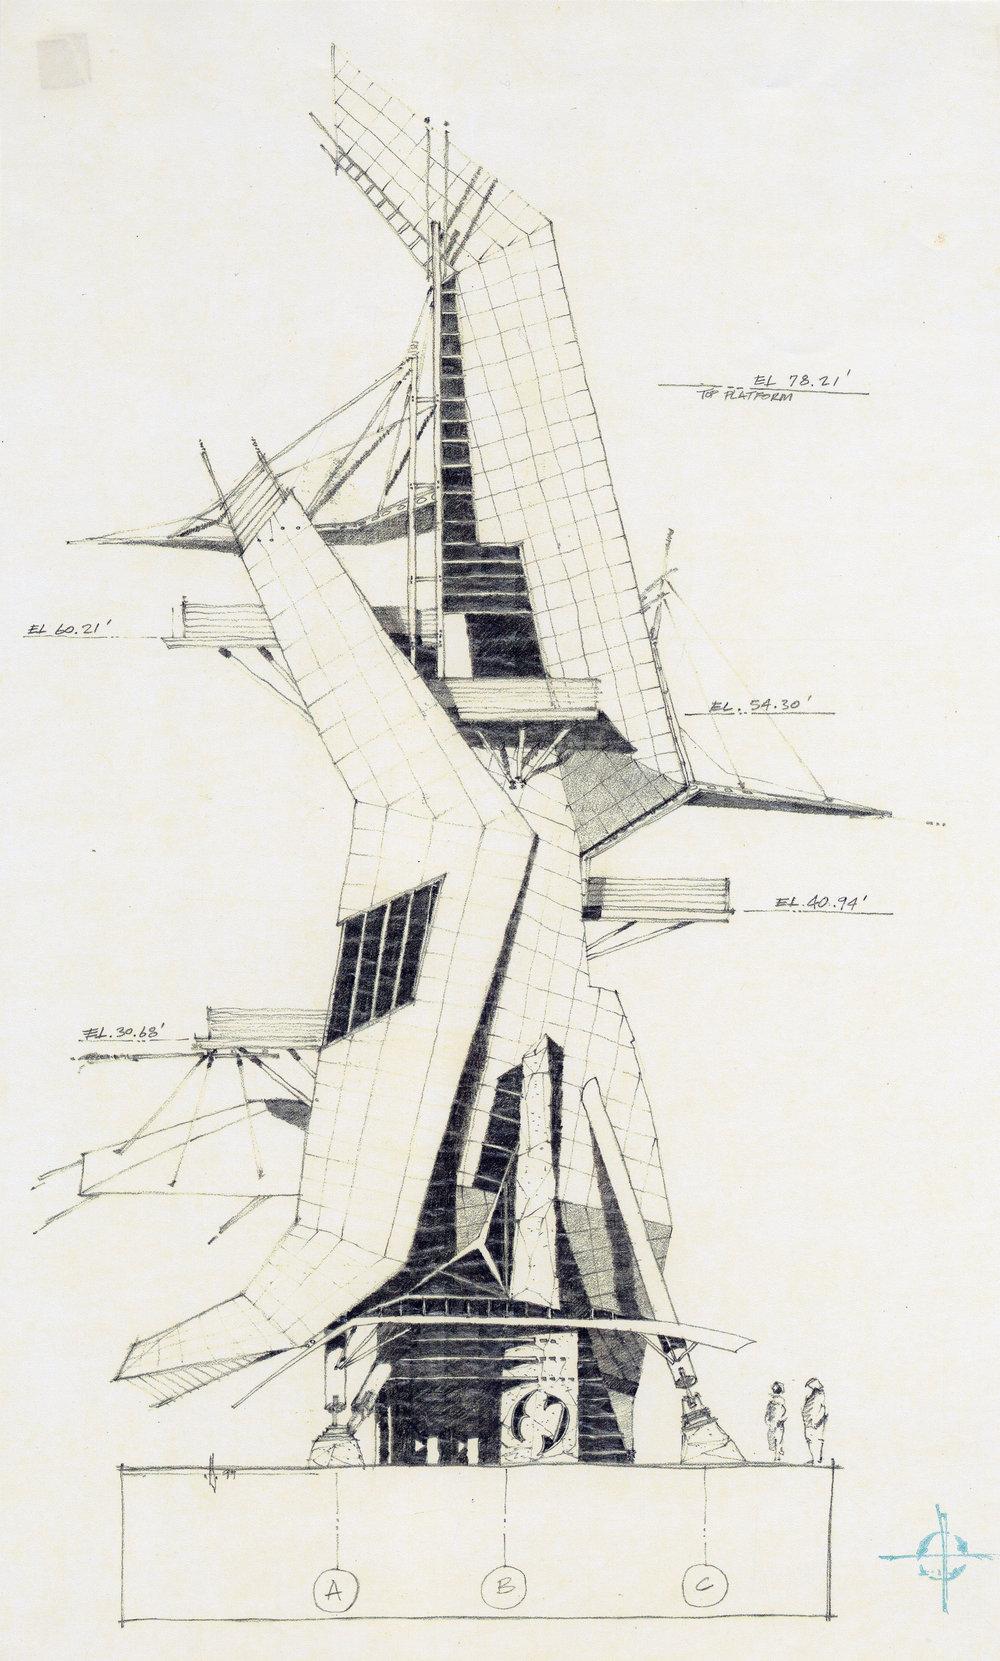 Lantern - High speed water slide towers